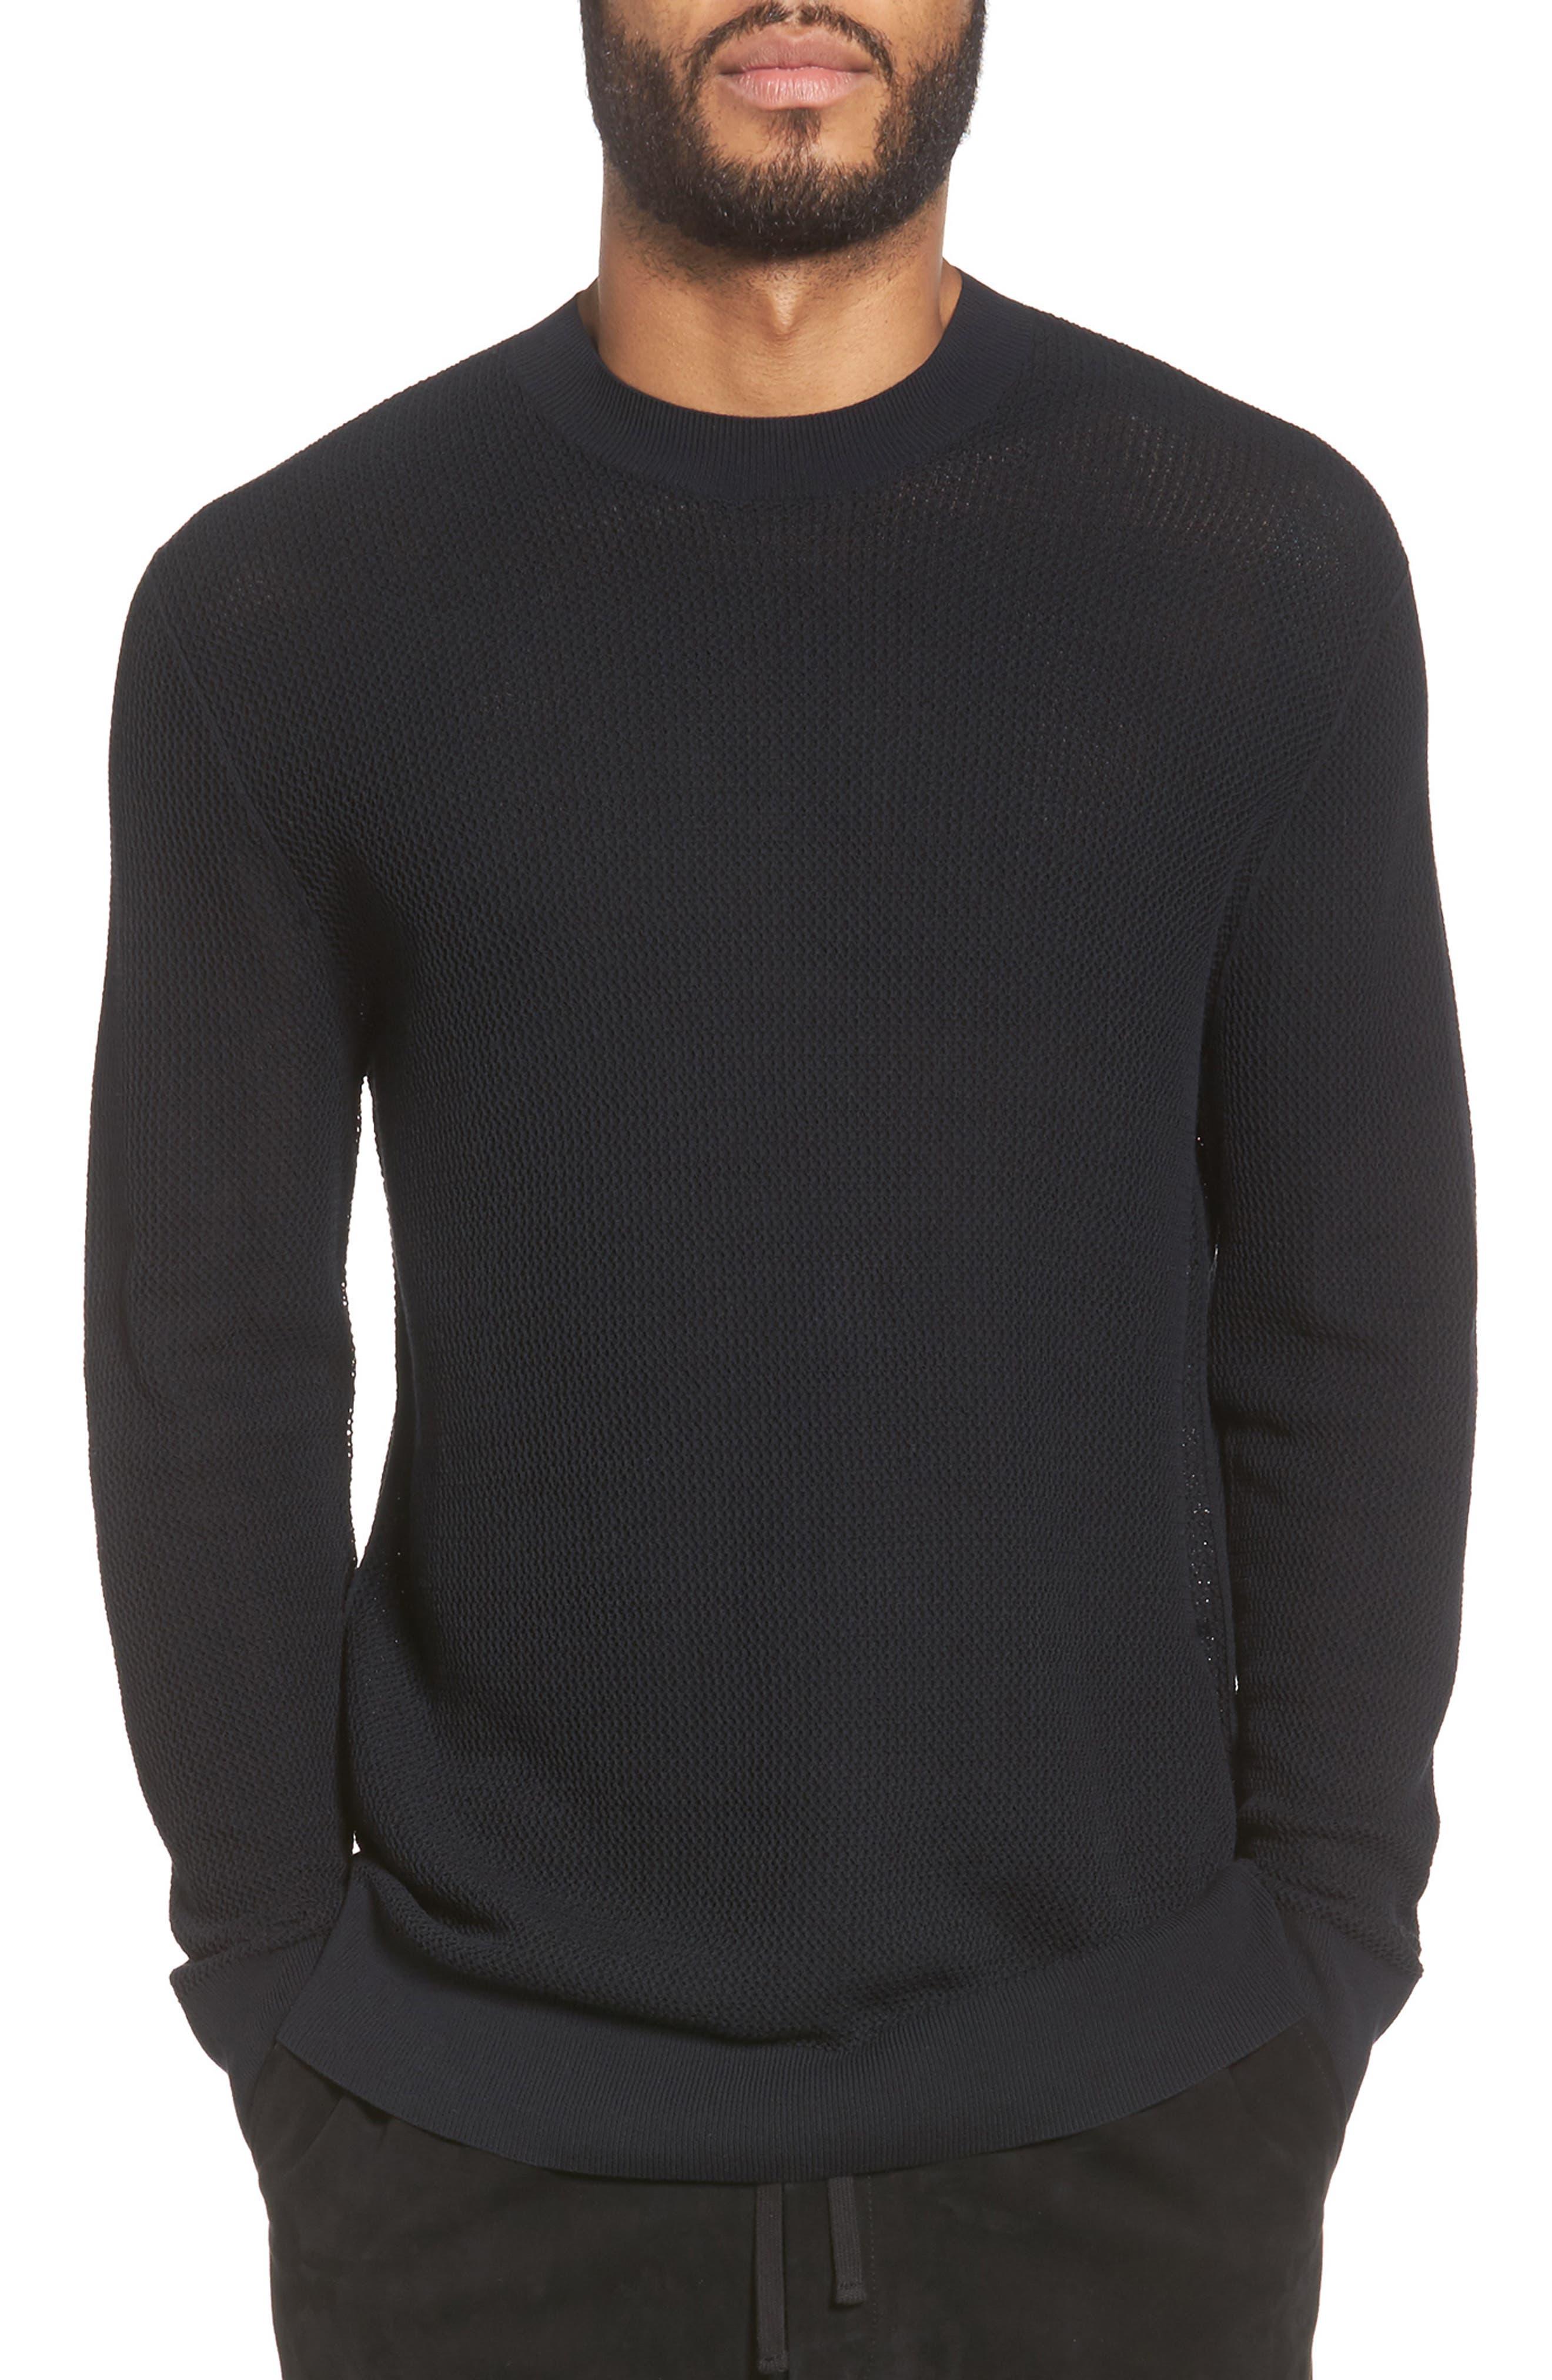 Alternate Image 1 Selected - Vince Mesh Crewneck Sweater